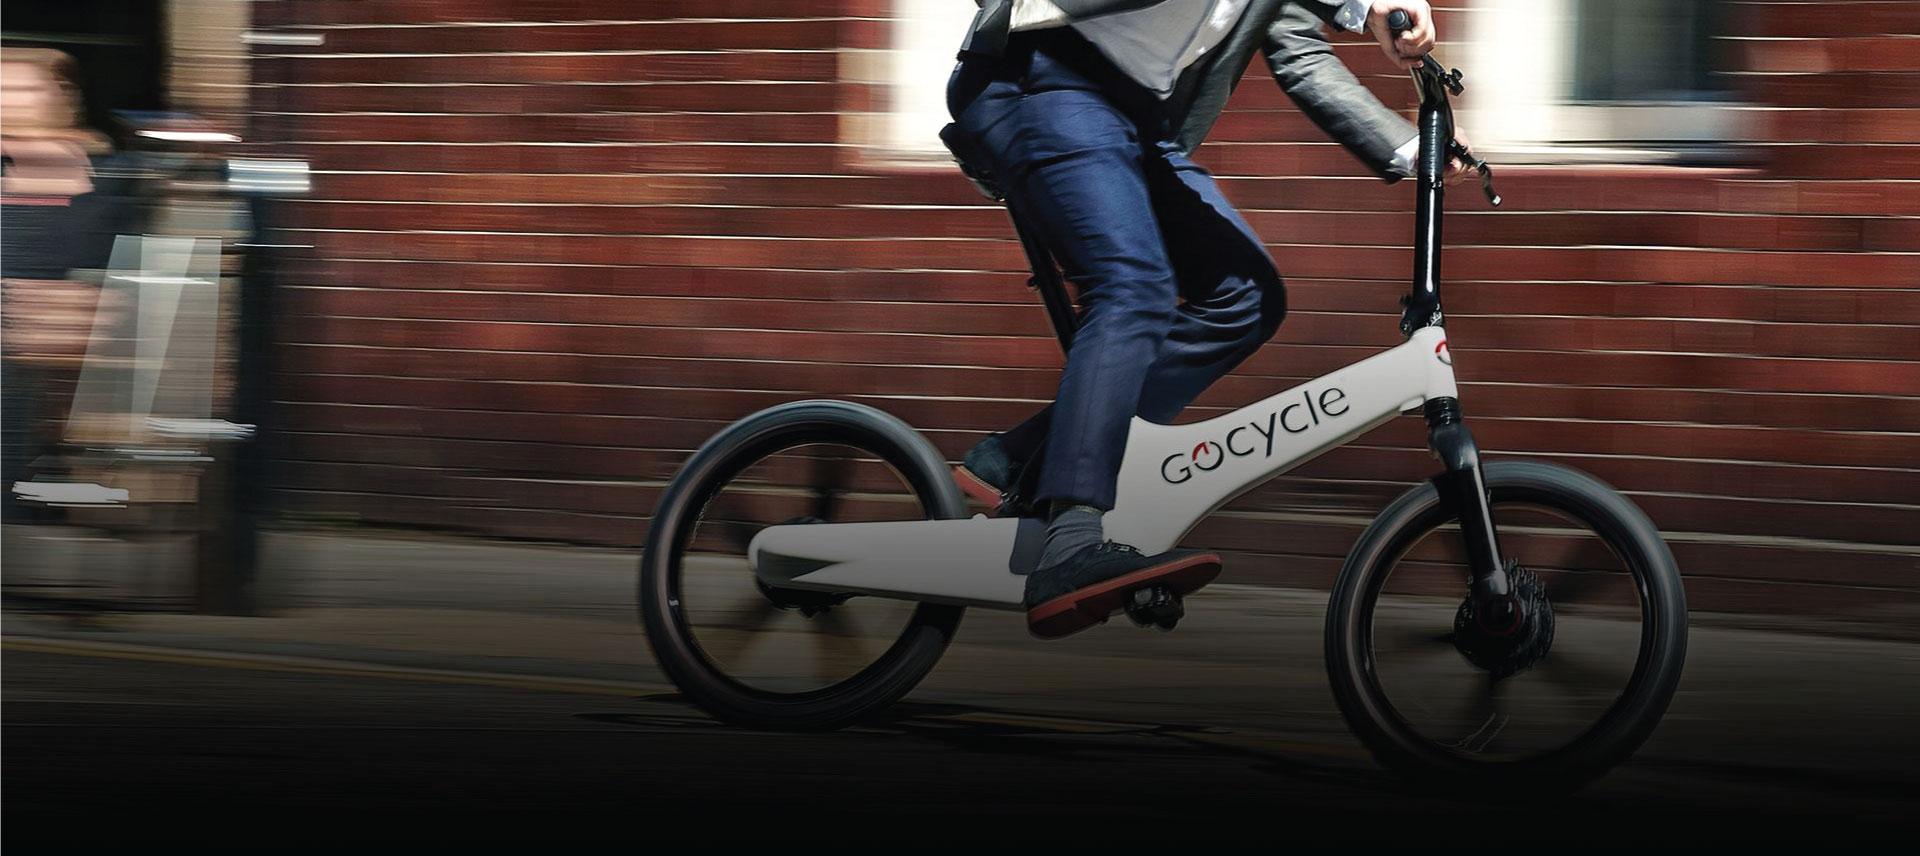 GoCycle G2C Hero | The Garage OTR